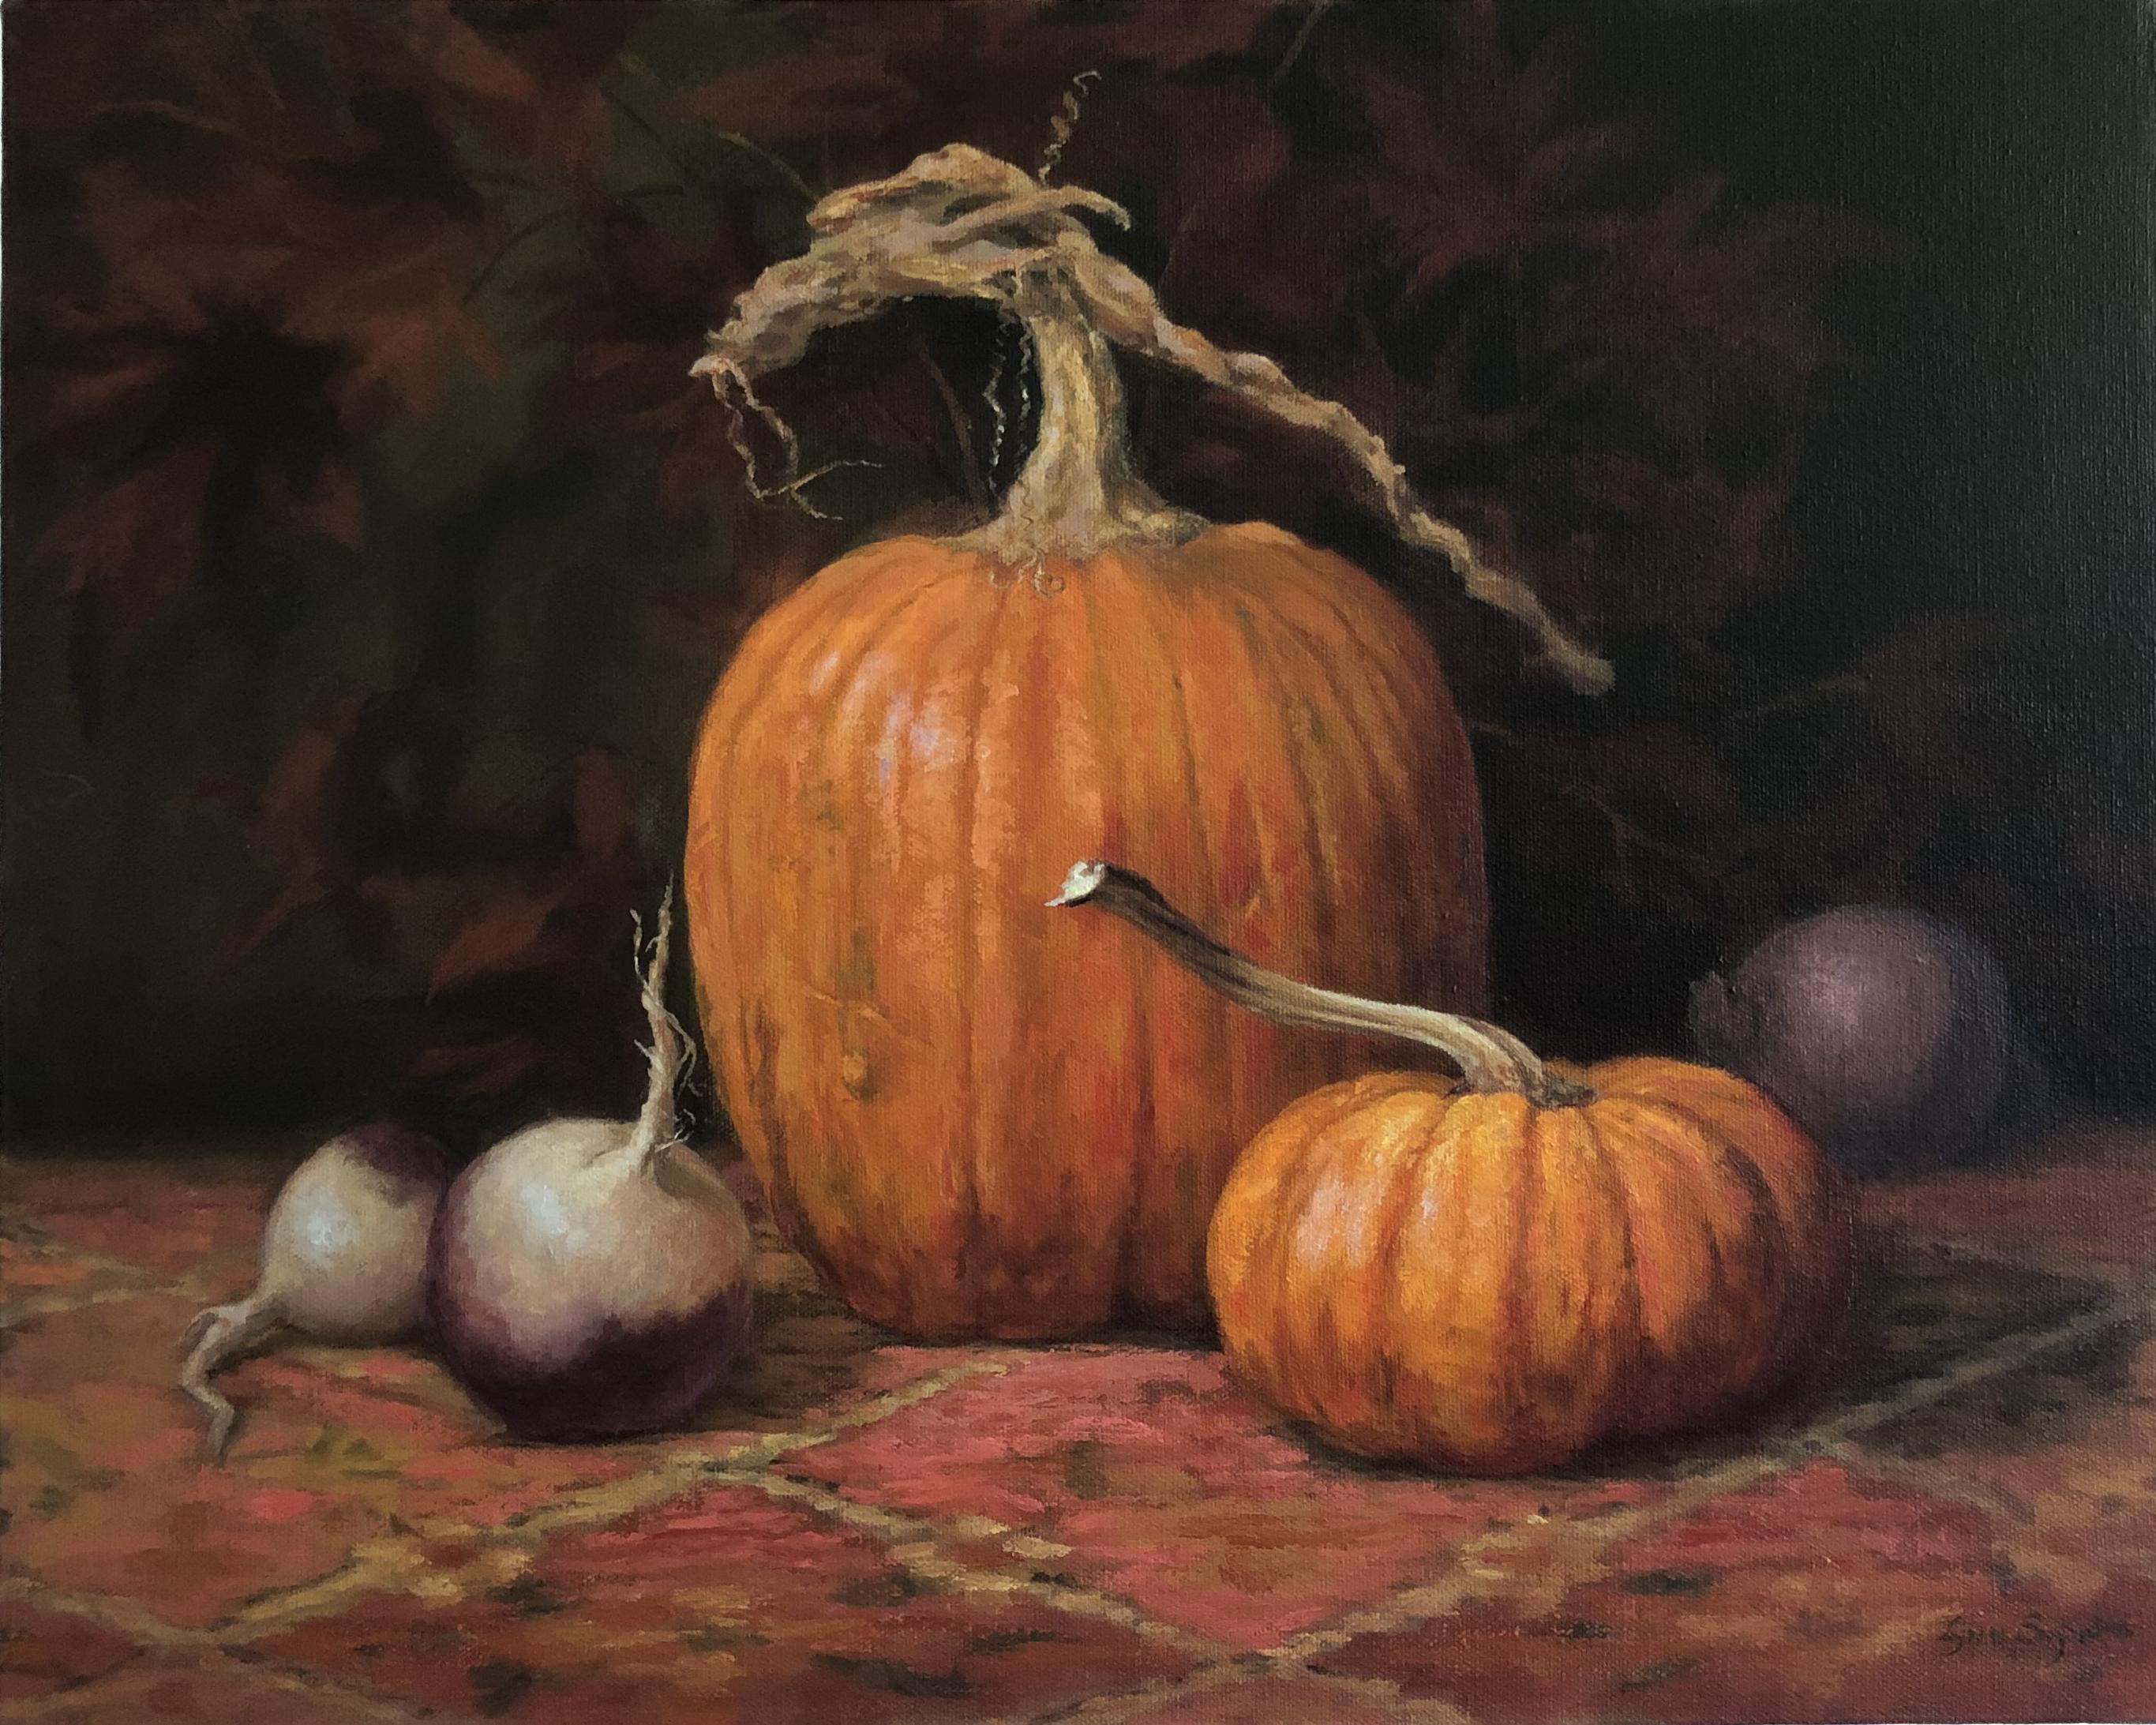 Pumpkins & Turnips